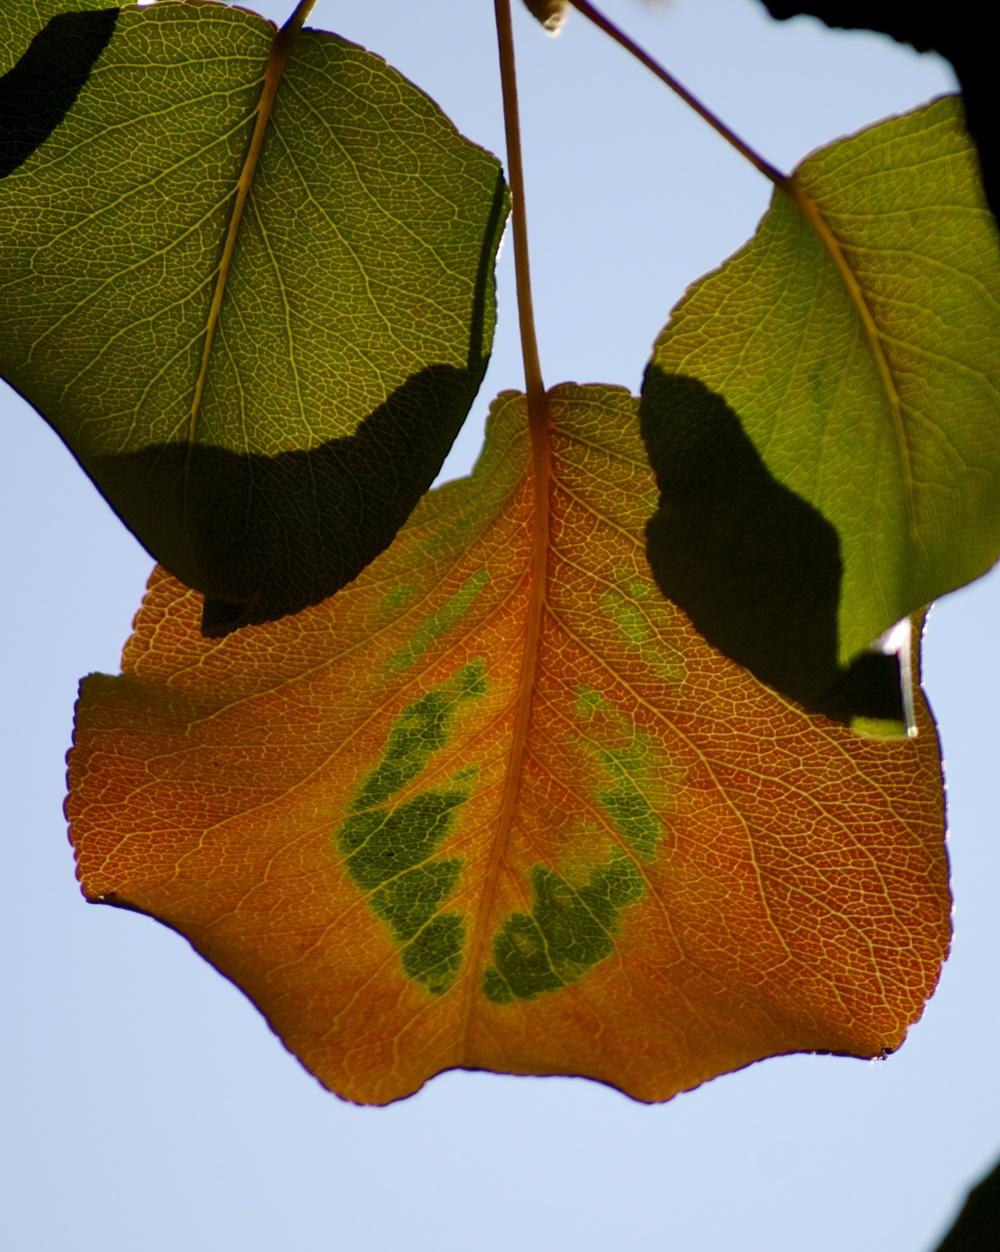 Callary Pear Leaves in Fall